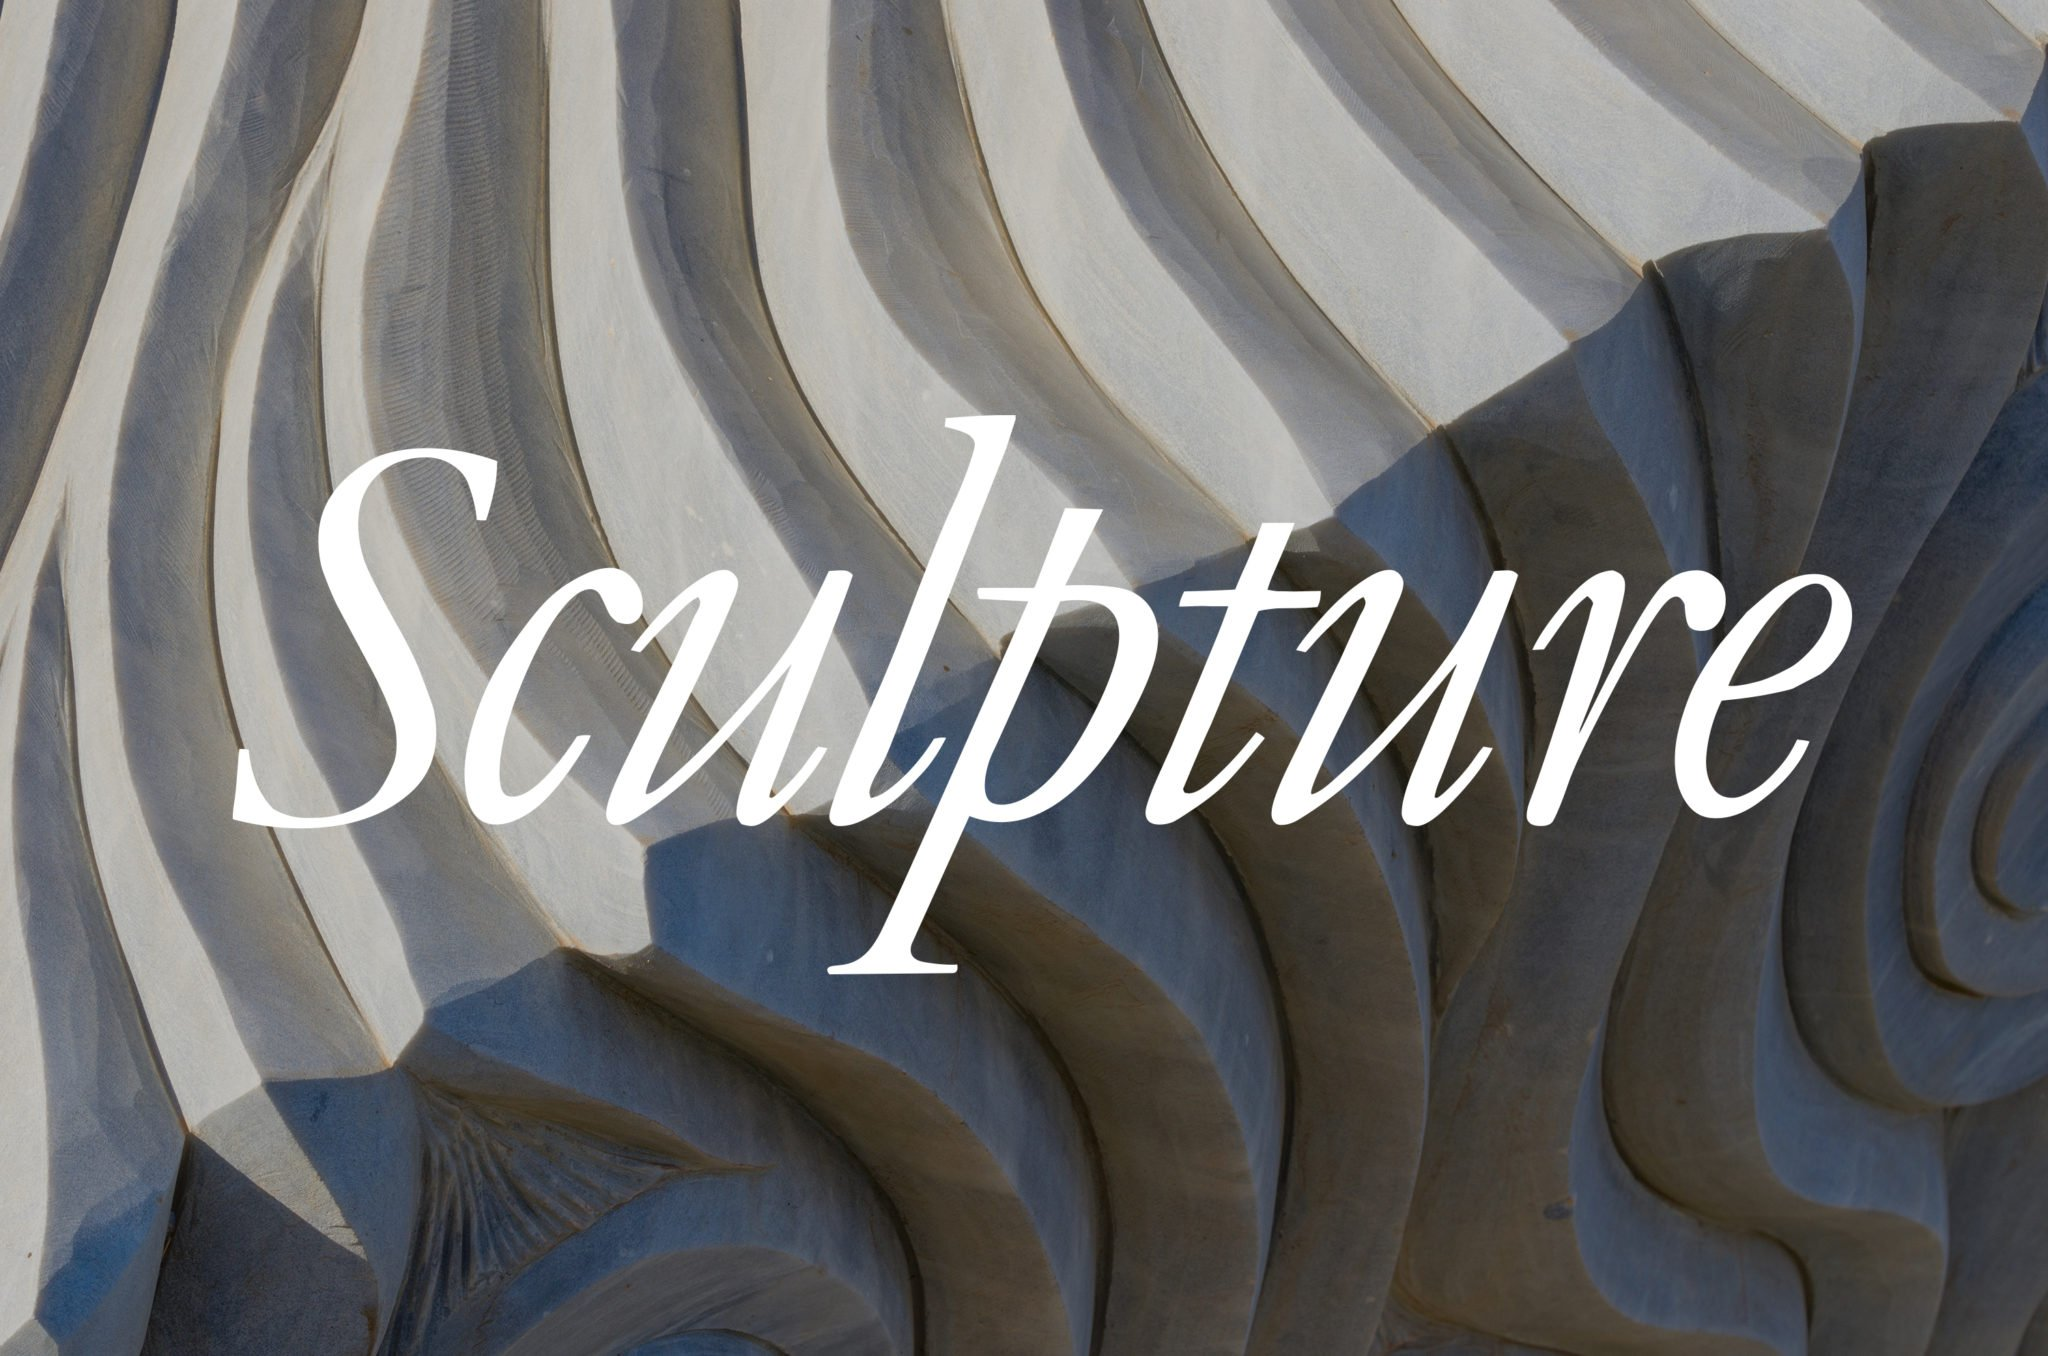 Sculpture Magazine Logo